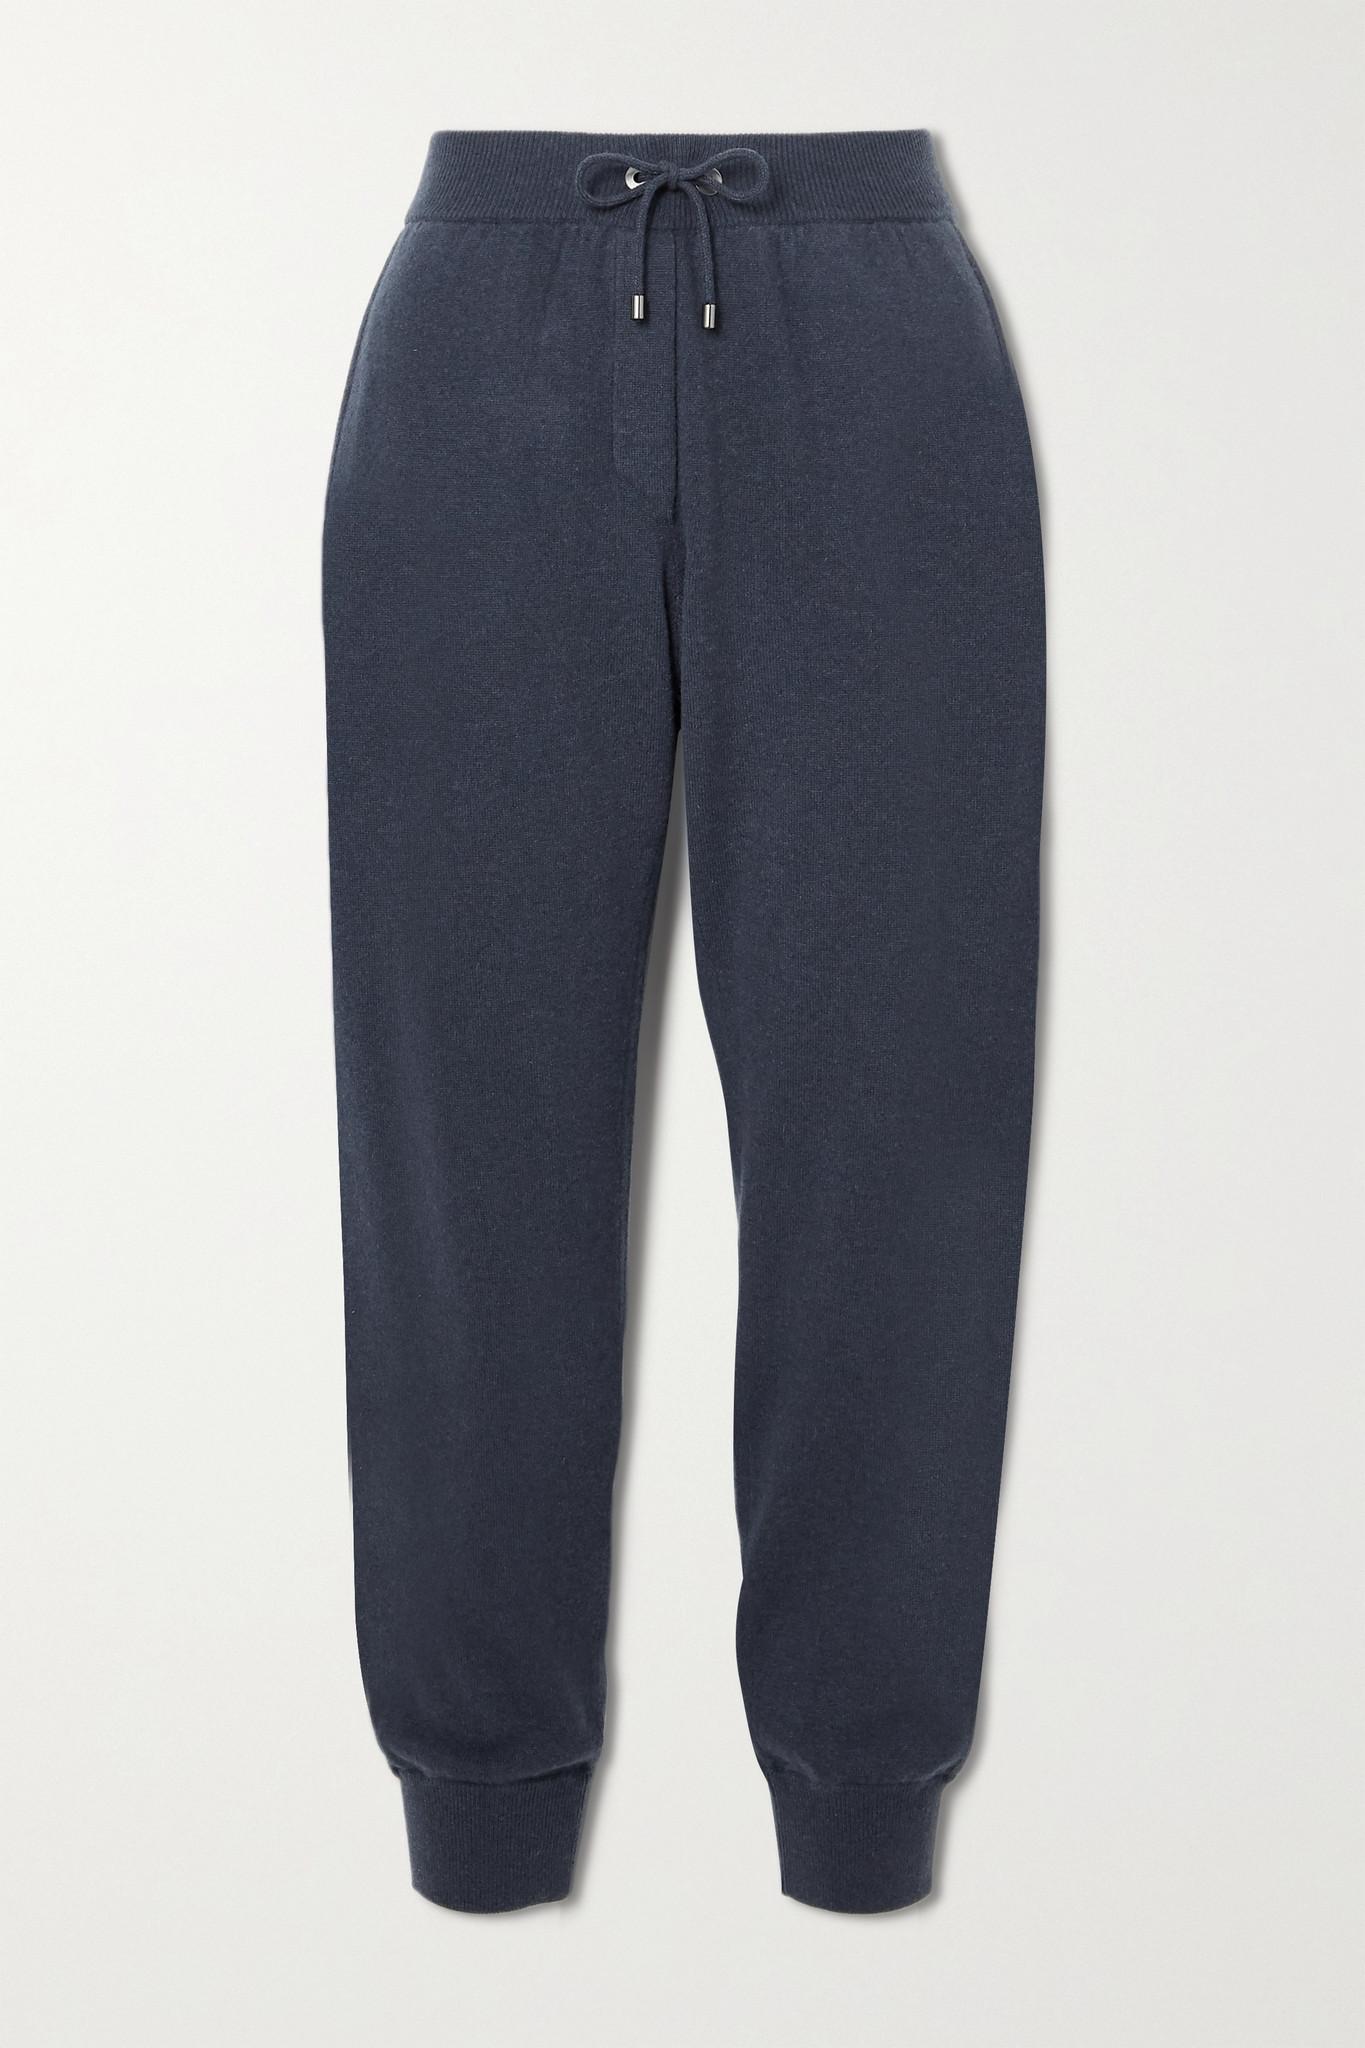 BRUNELLO CUCINELLI - 珠饰缀饰羊毛羊绒真丝混纺九分运动裤 - 蓝色 - x small